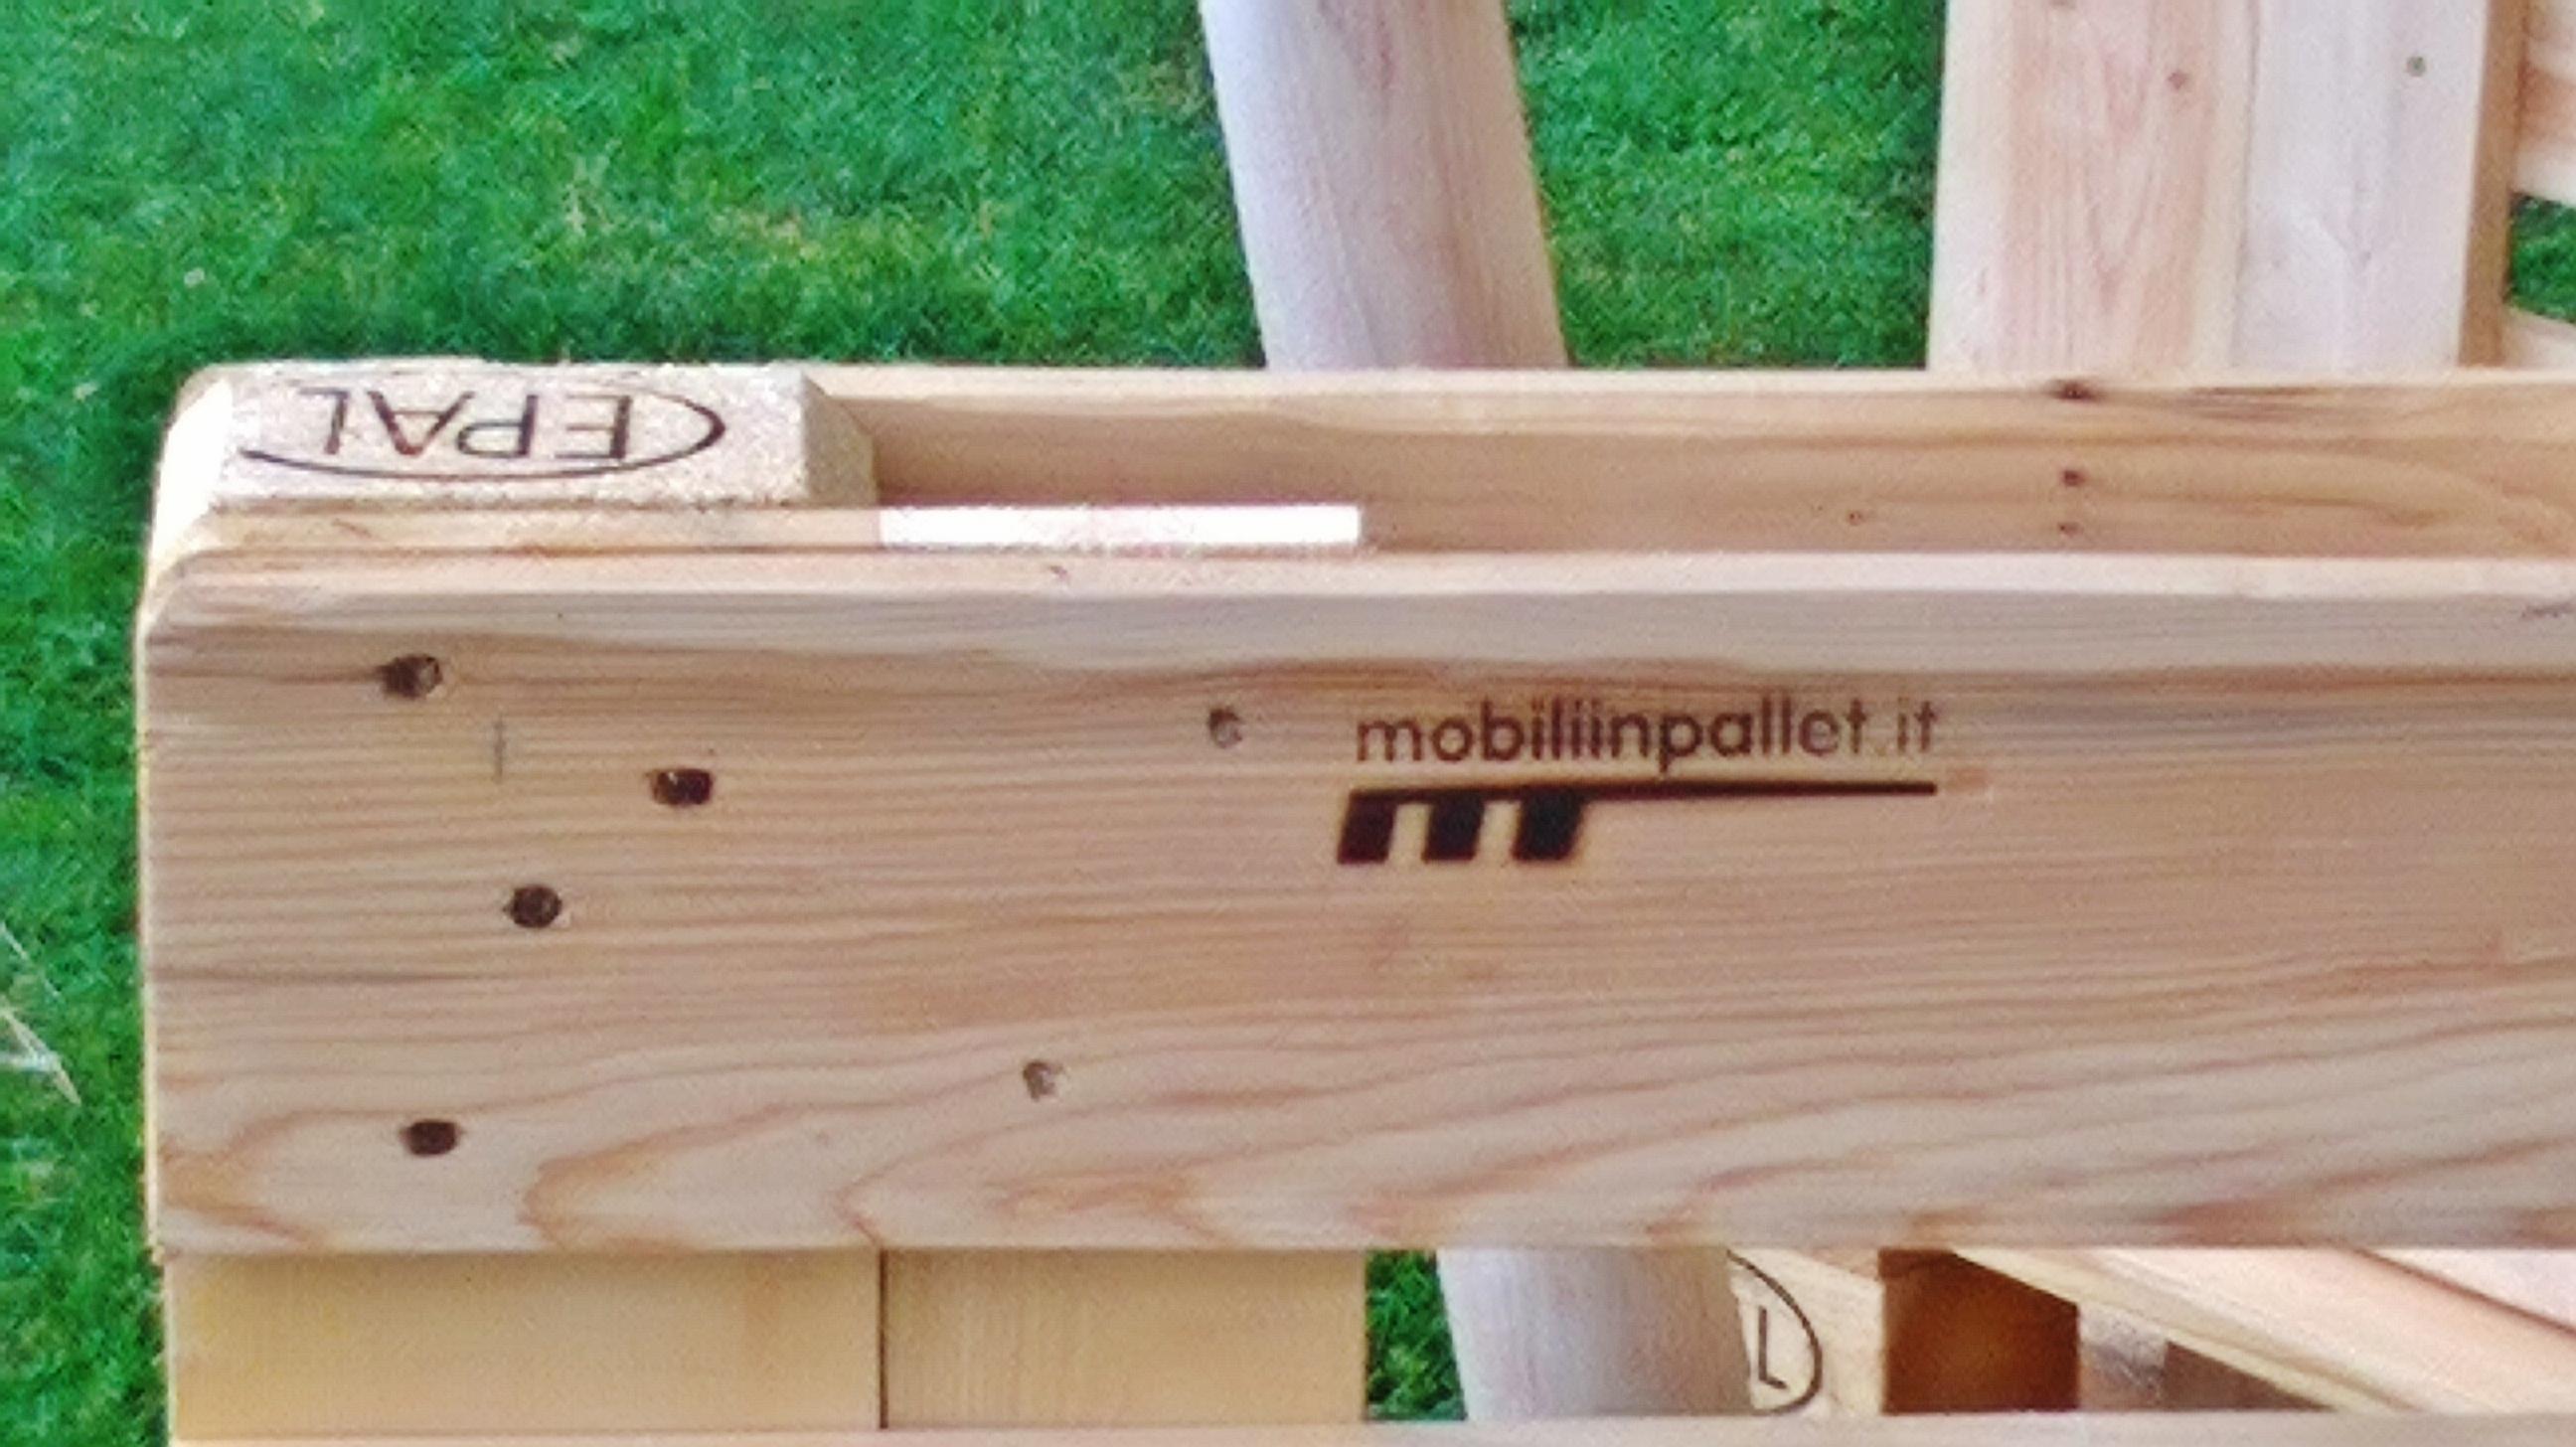 Mobiliinpallet.it arreda Castel Gandolfo - mobili in pallet